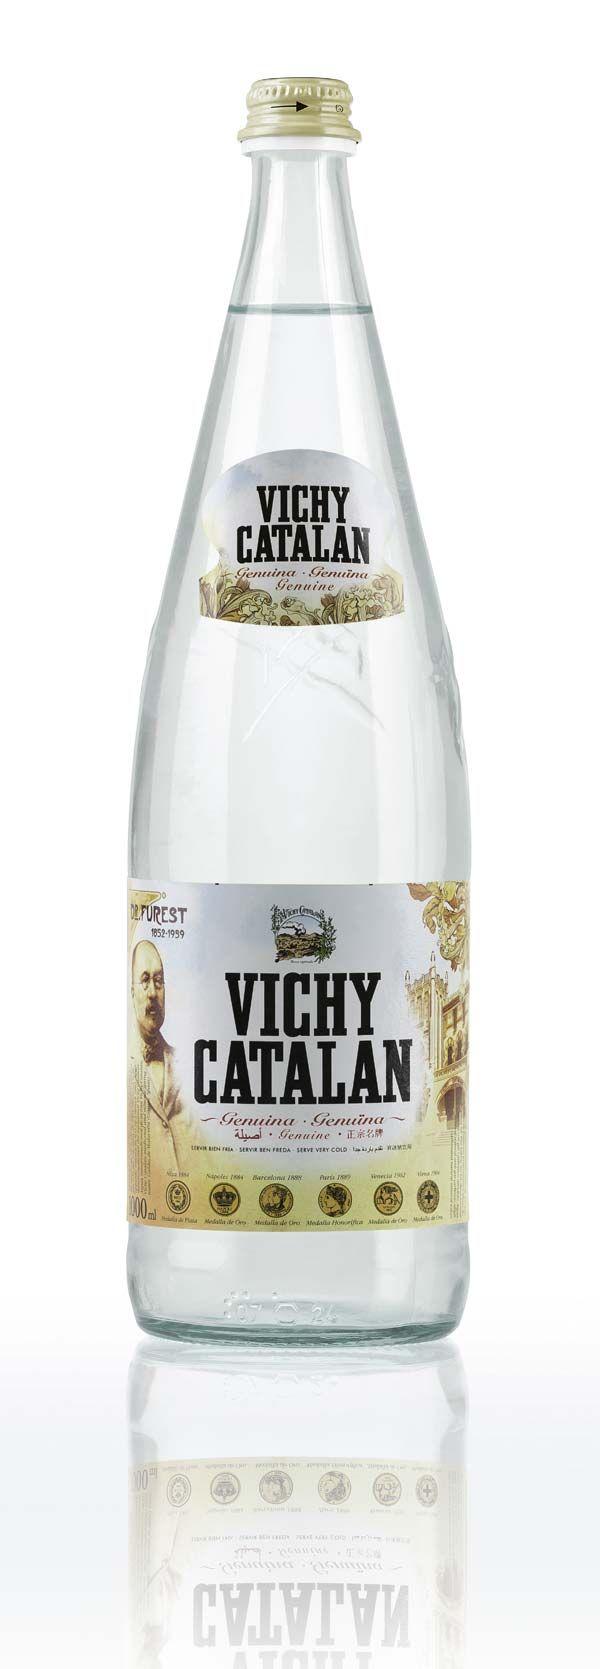 Vichy Catalán, agua mineral natural carbónica